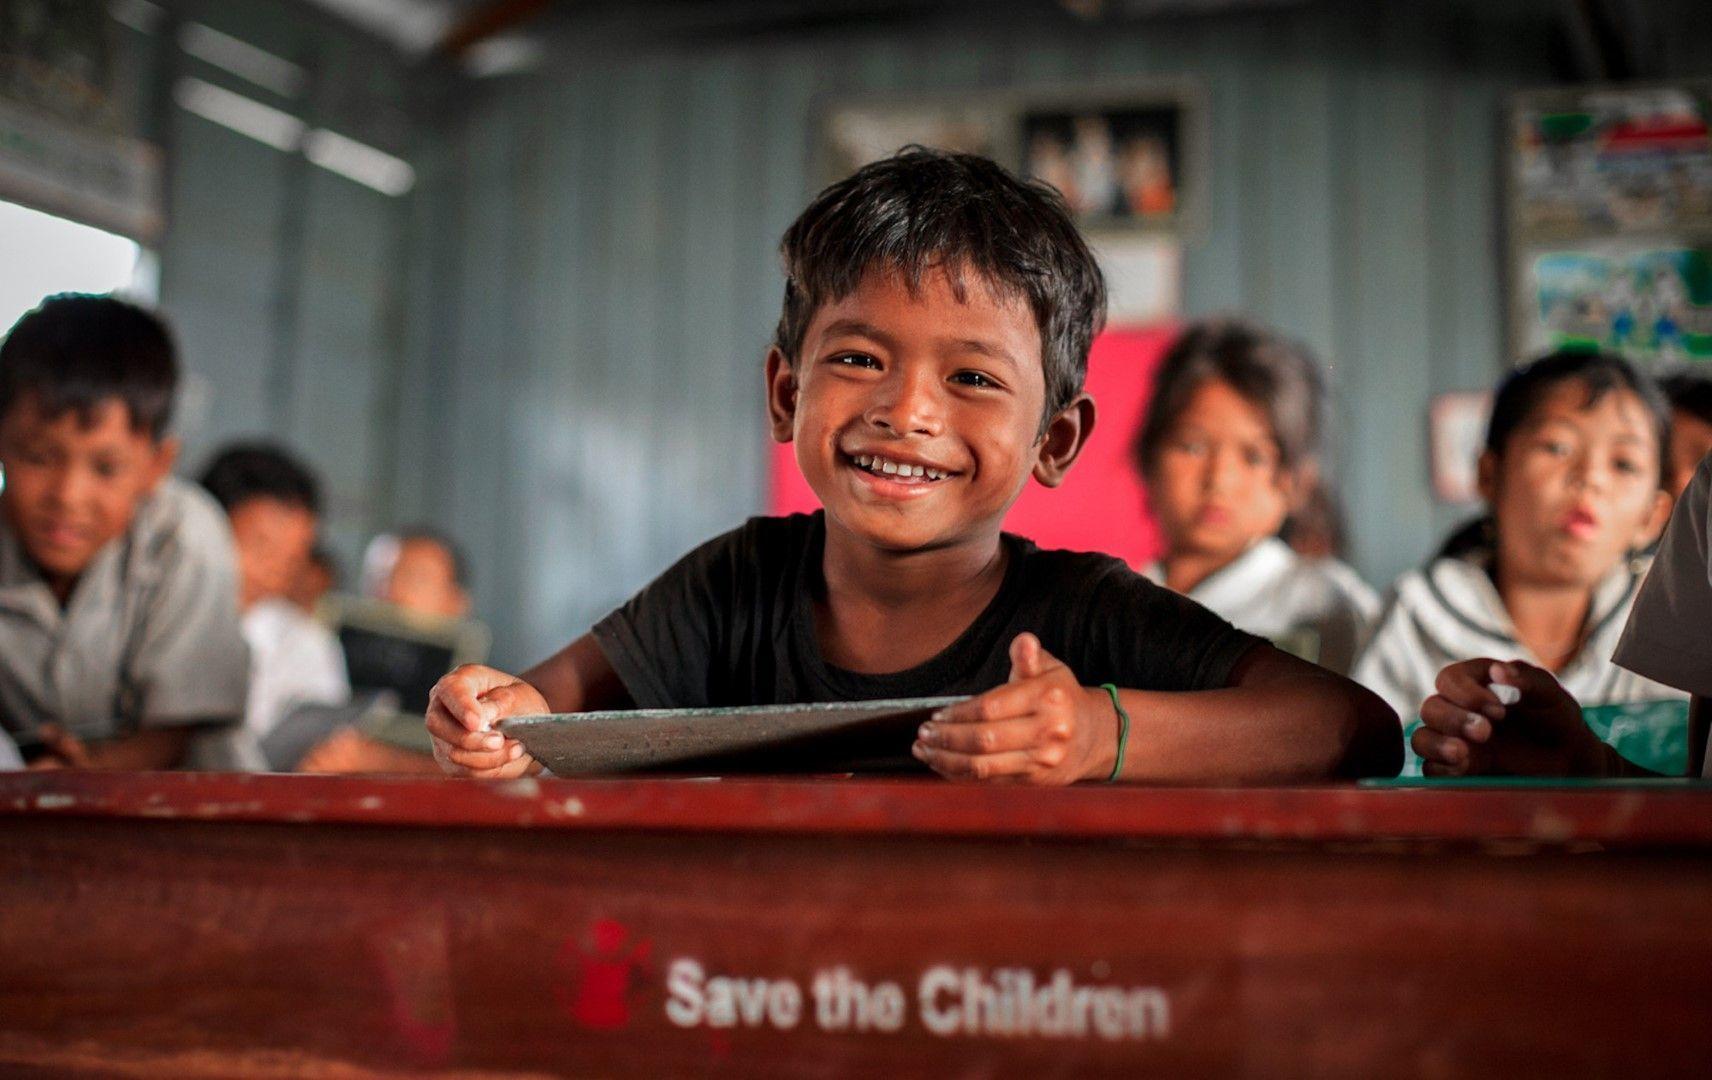 Save the Children, encuentra su aliado digital · T2O media